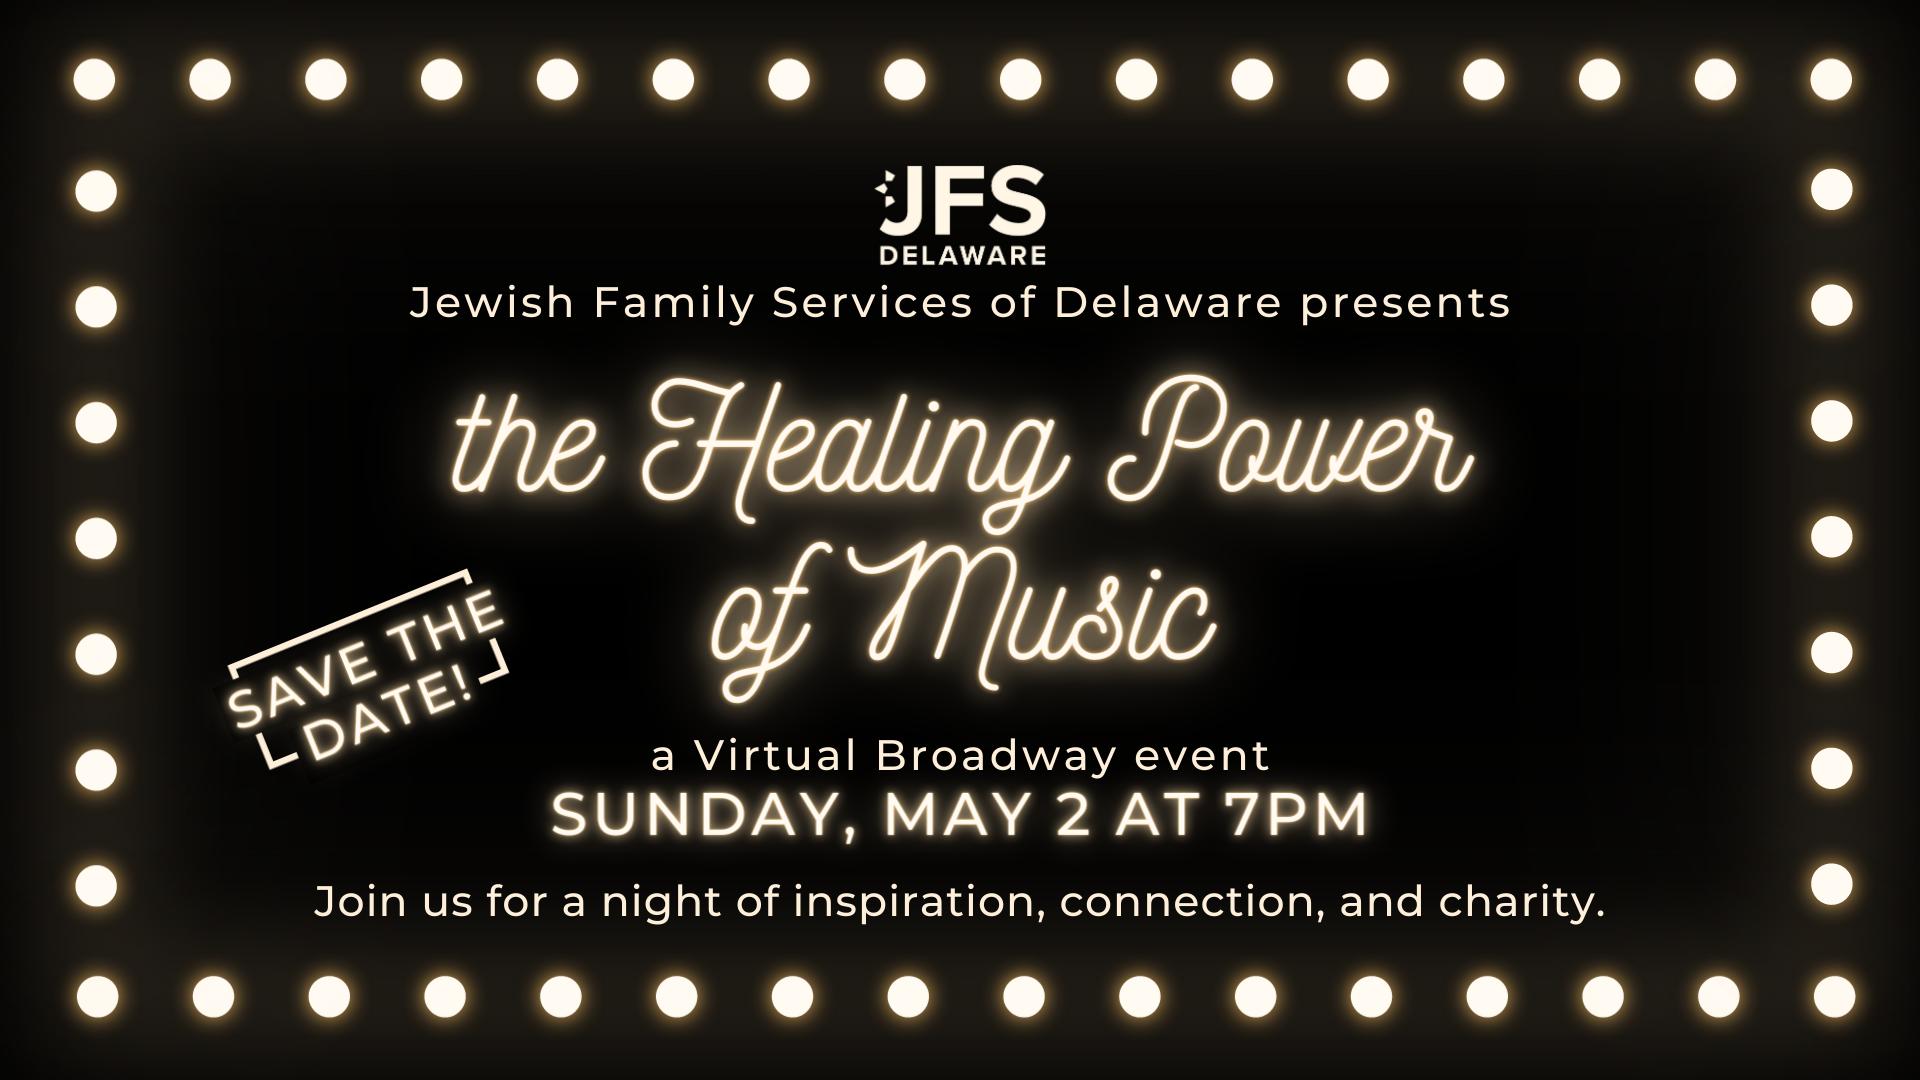 The Healing Power of Music: JFS' Virtual Broadway Event